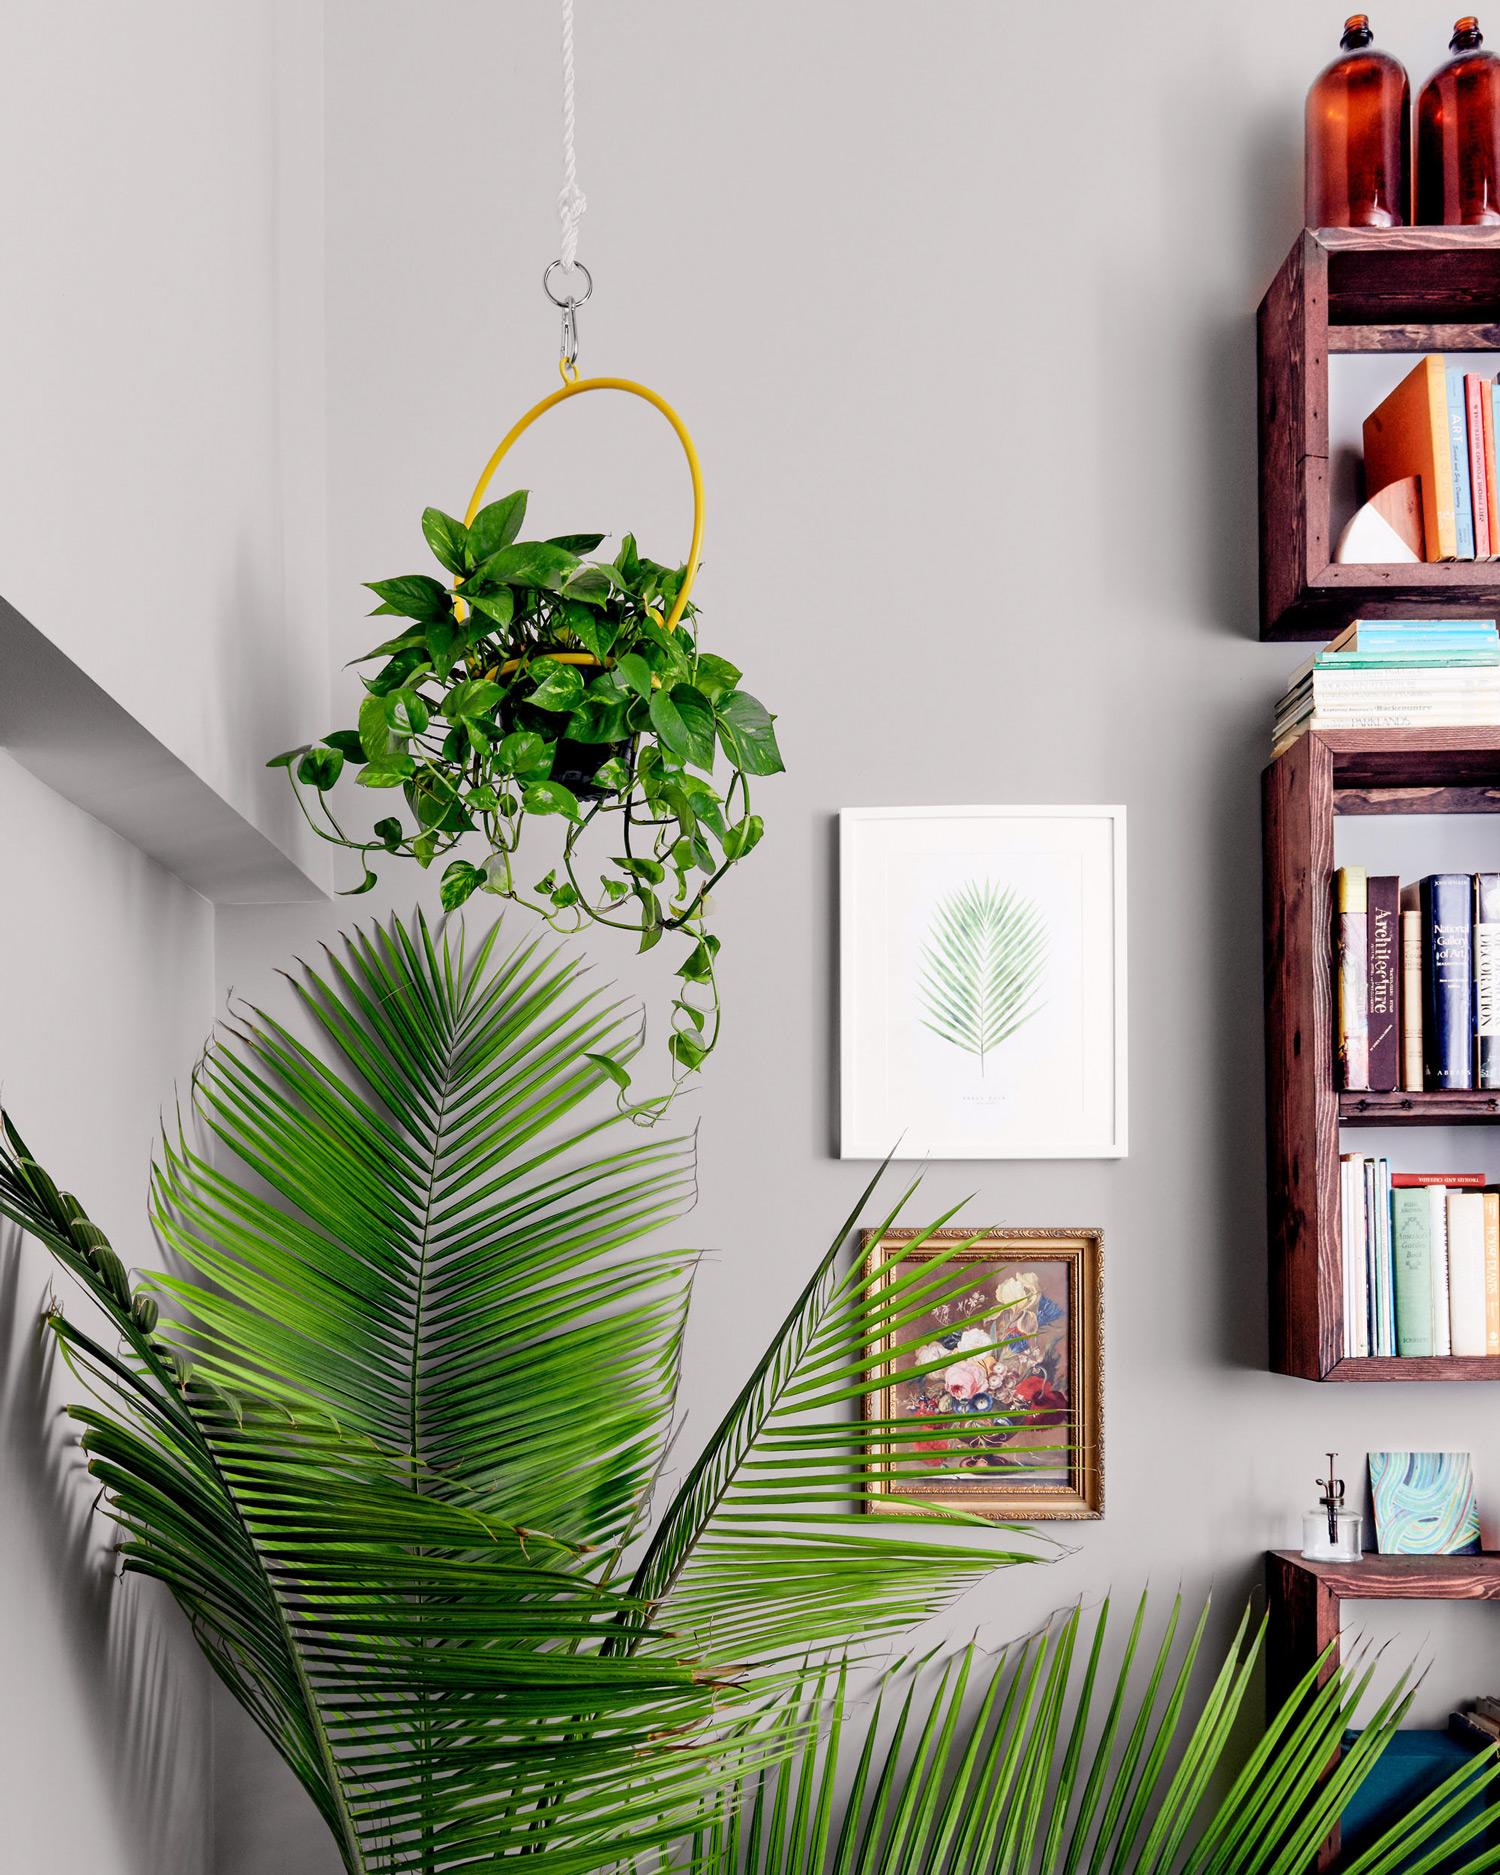 hanging planter above palm plant